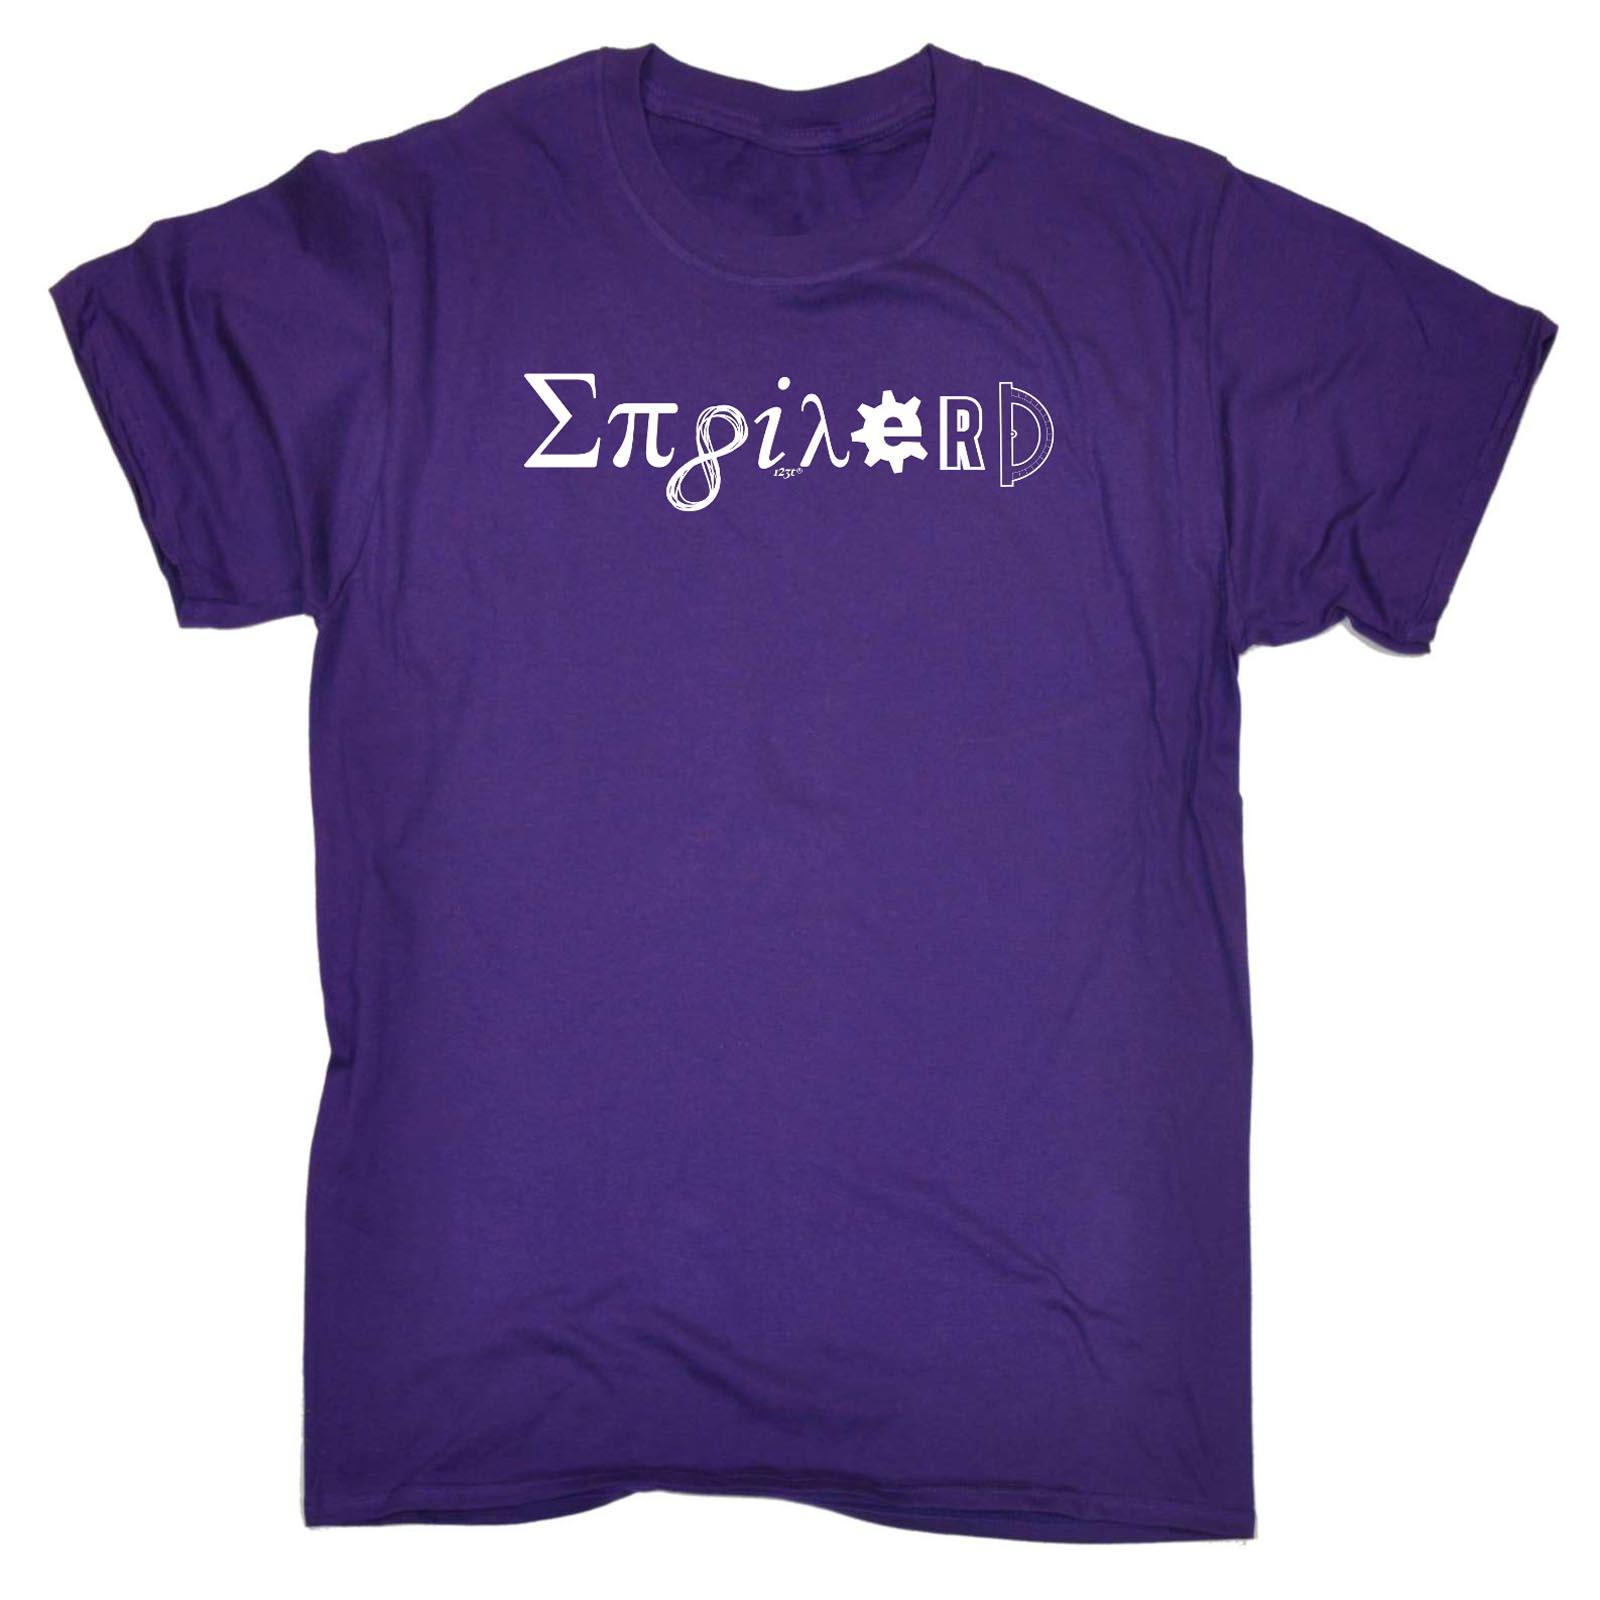 Funny-Novelty-T-Shirt-Mens-tee-TShirt-Enginerd miniatuur 12